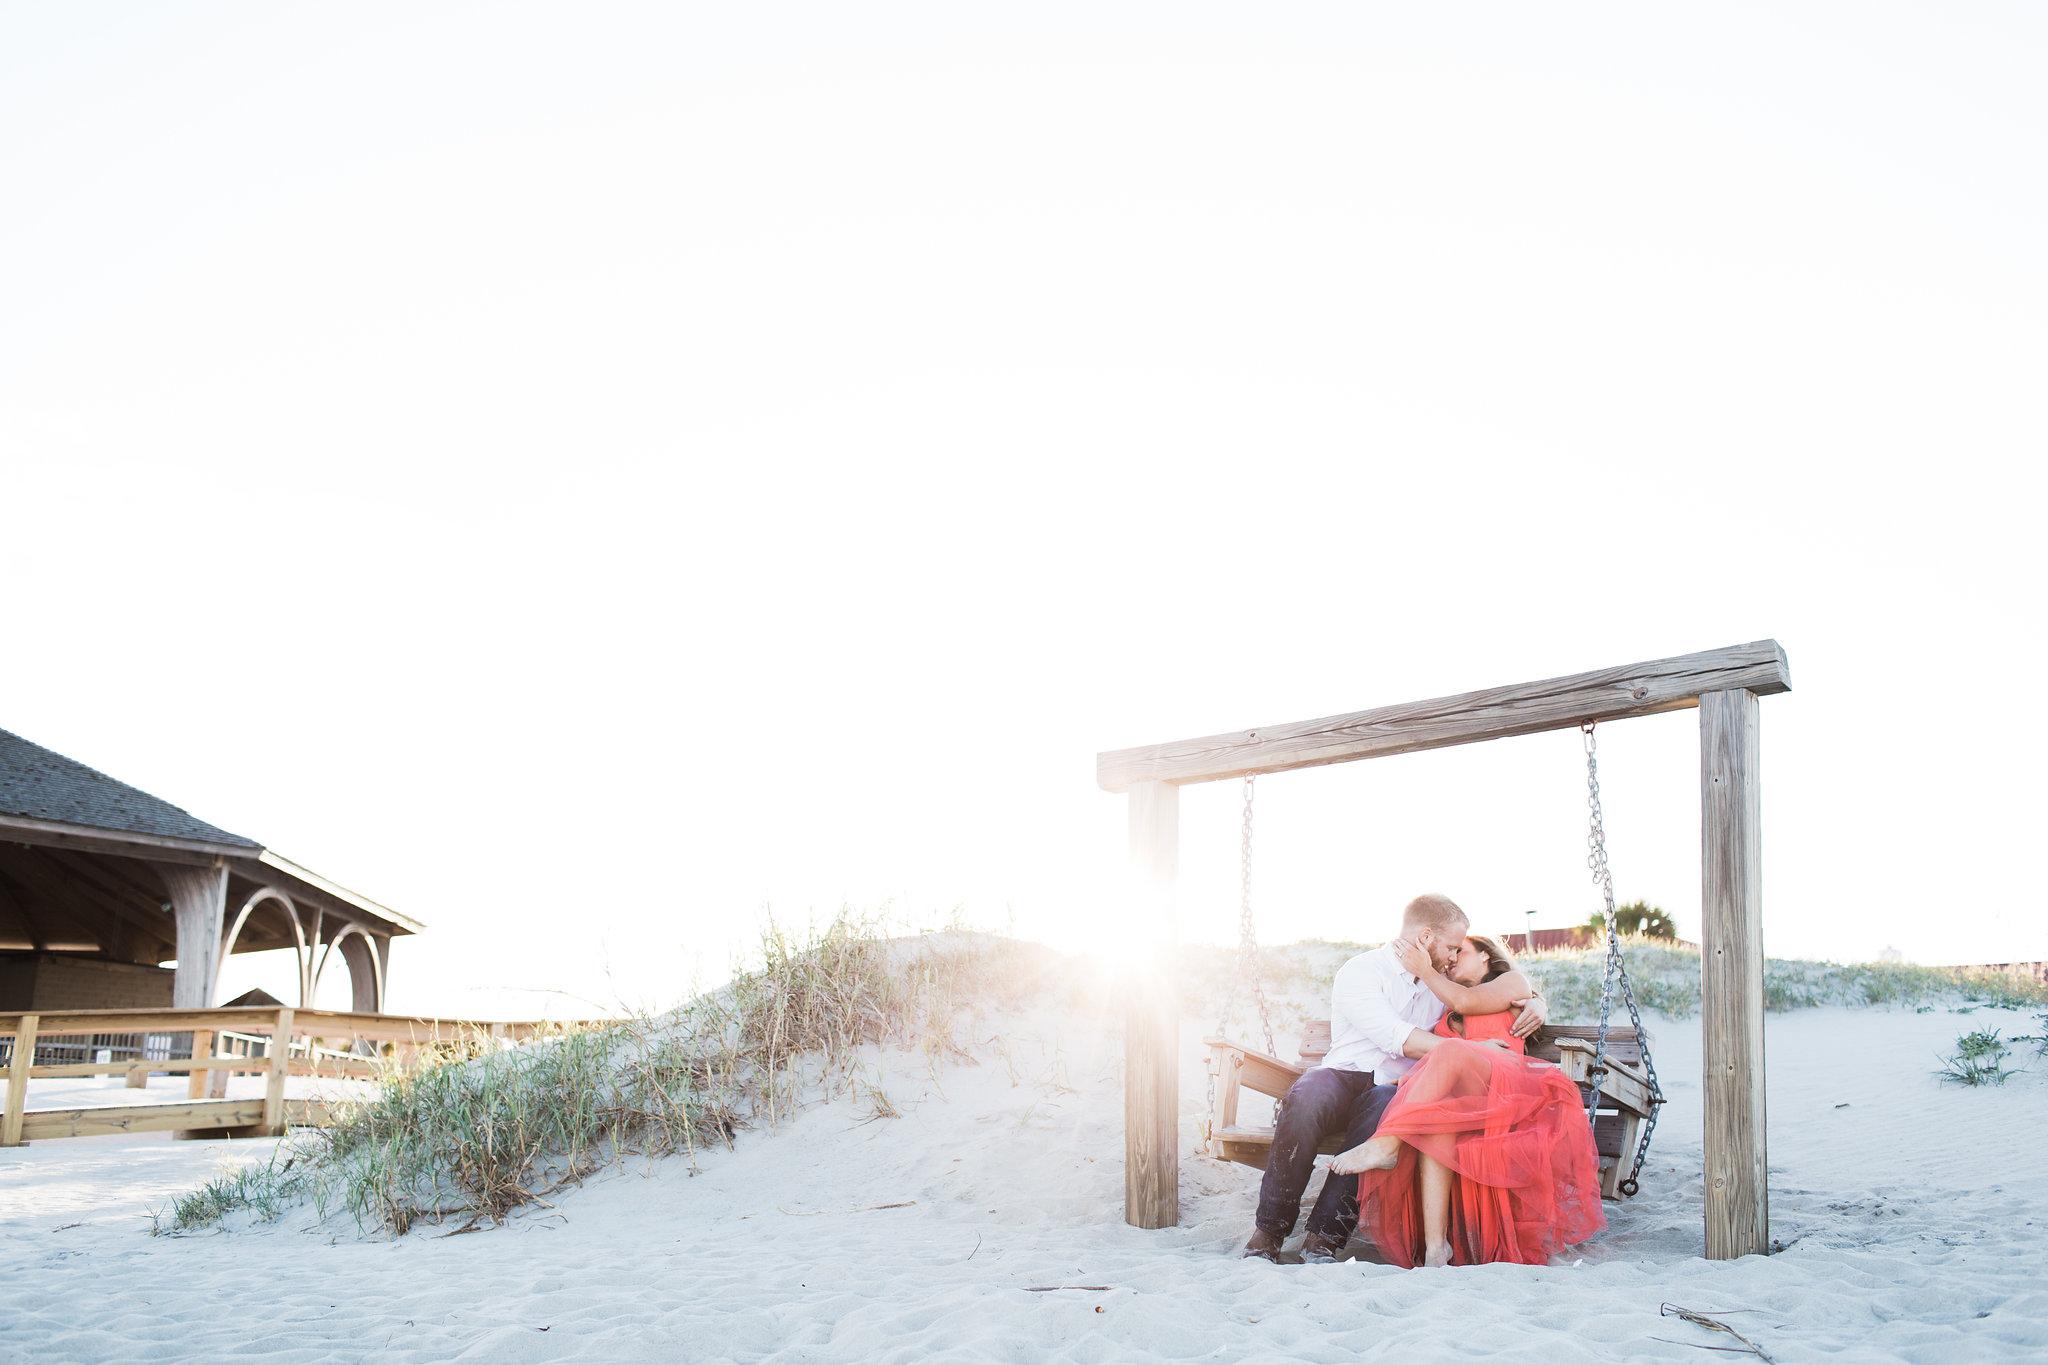 Erin-kevin-apt-b-photography-tybee-island-engagement-photoshoot-savannah-engagement-savannah-wedding-savannah-wedding-photographer-tybee-island-wedding-beach-engagement-tybee-island-sunset-16.jpg